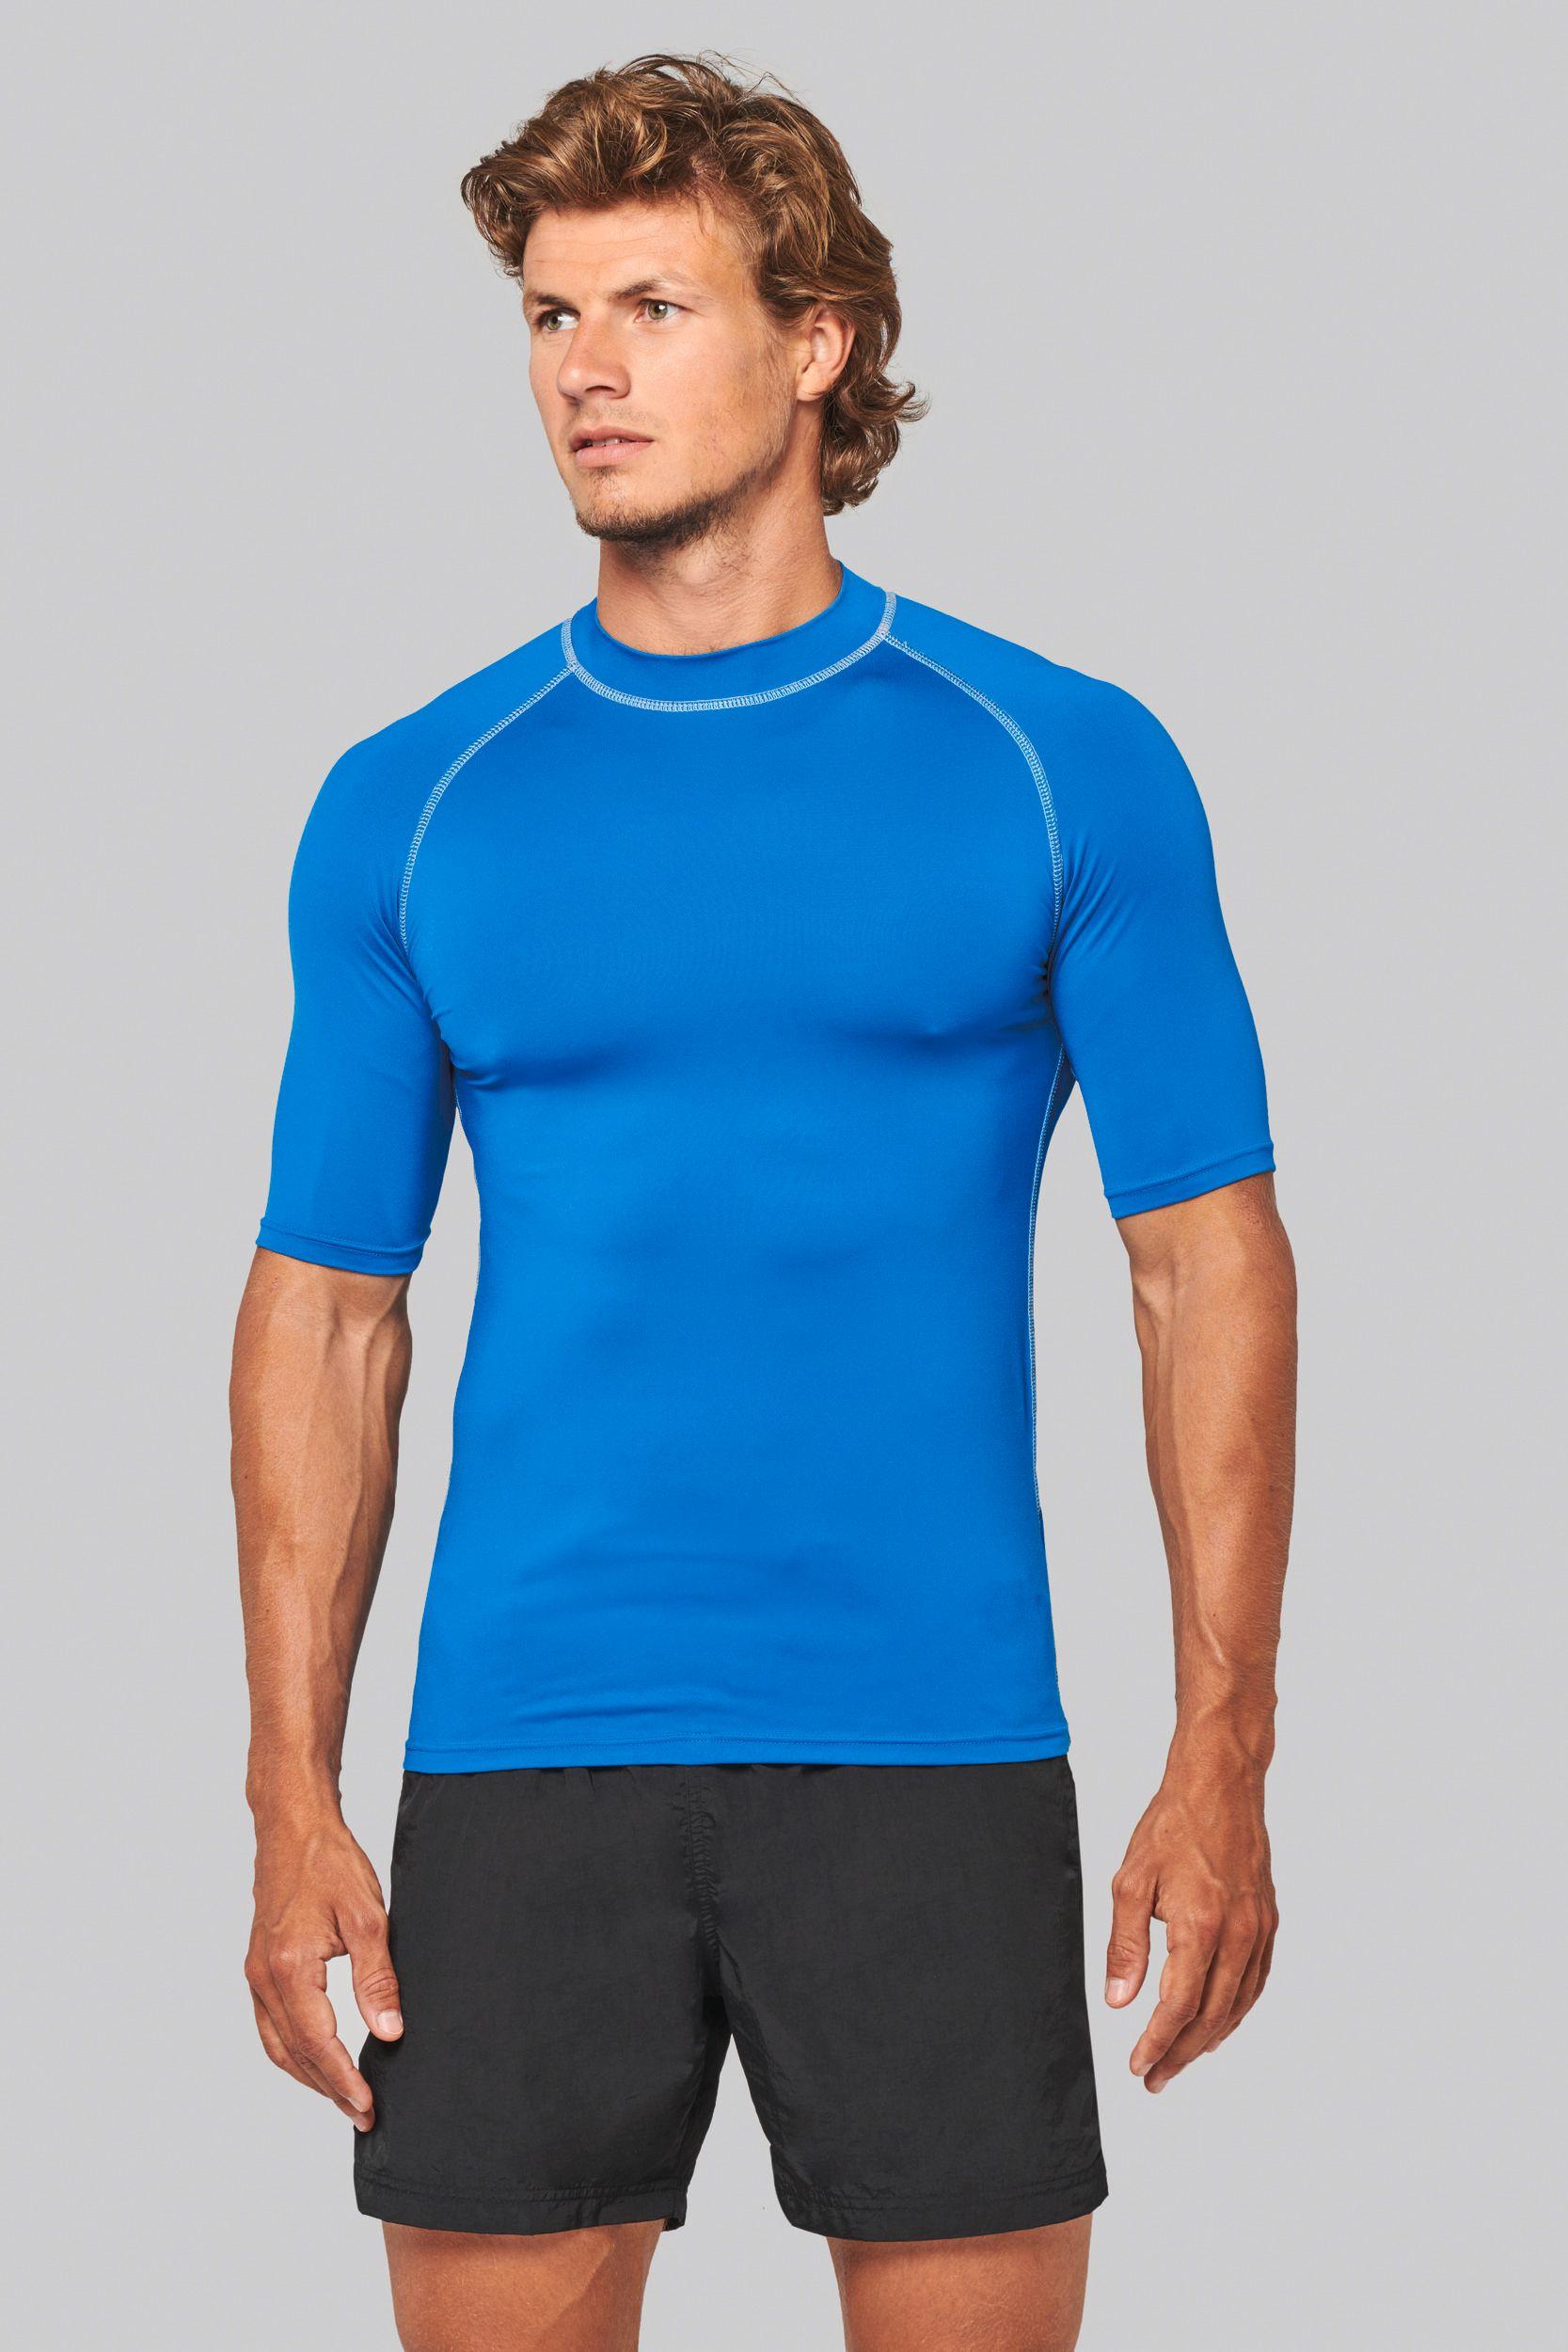 Tričko proti slunci s UV filtrem